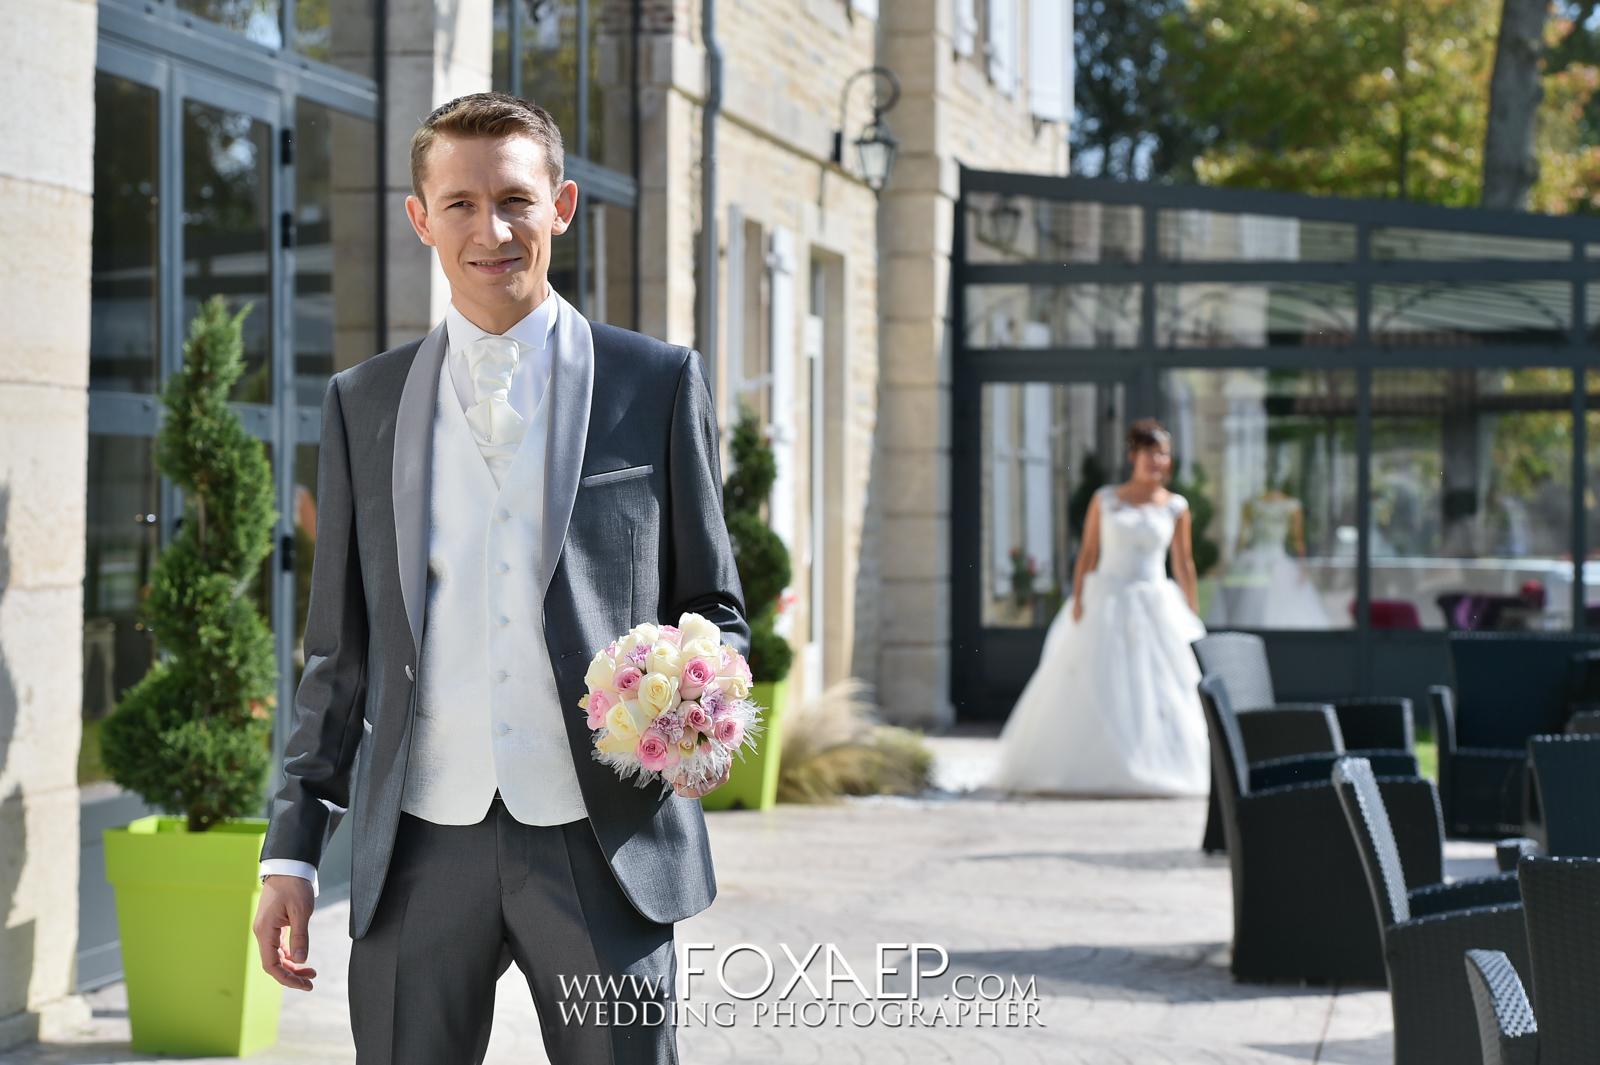 FOXAEP-MARIAGE-LIM-LAWTAG-1443